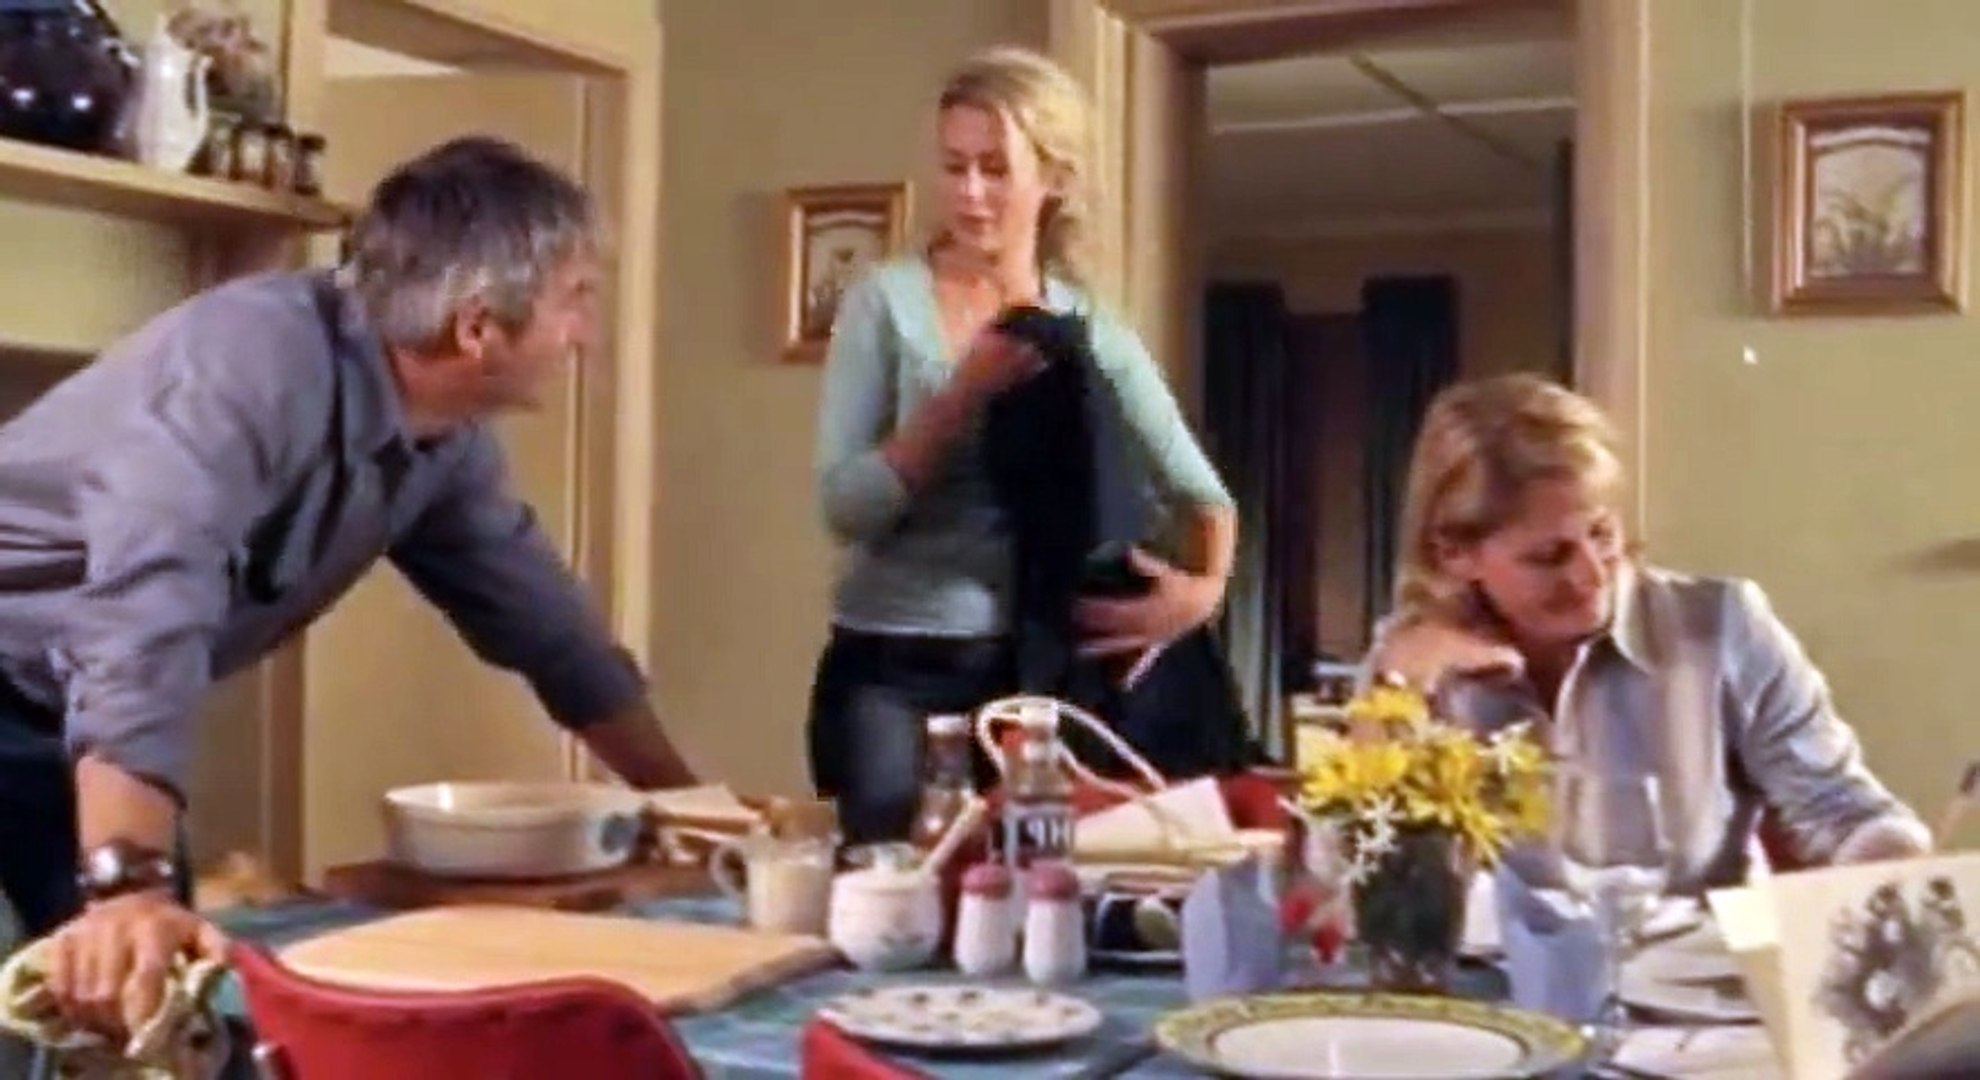 McLeod's Daughters S03 - Ep26 Body Language (aka The Bottom Line) HD Watch